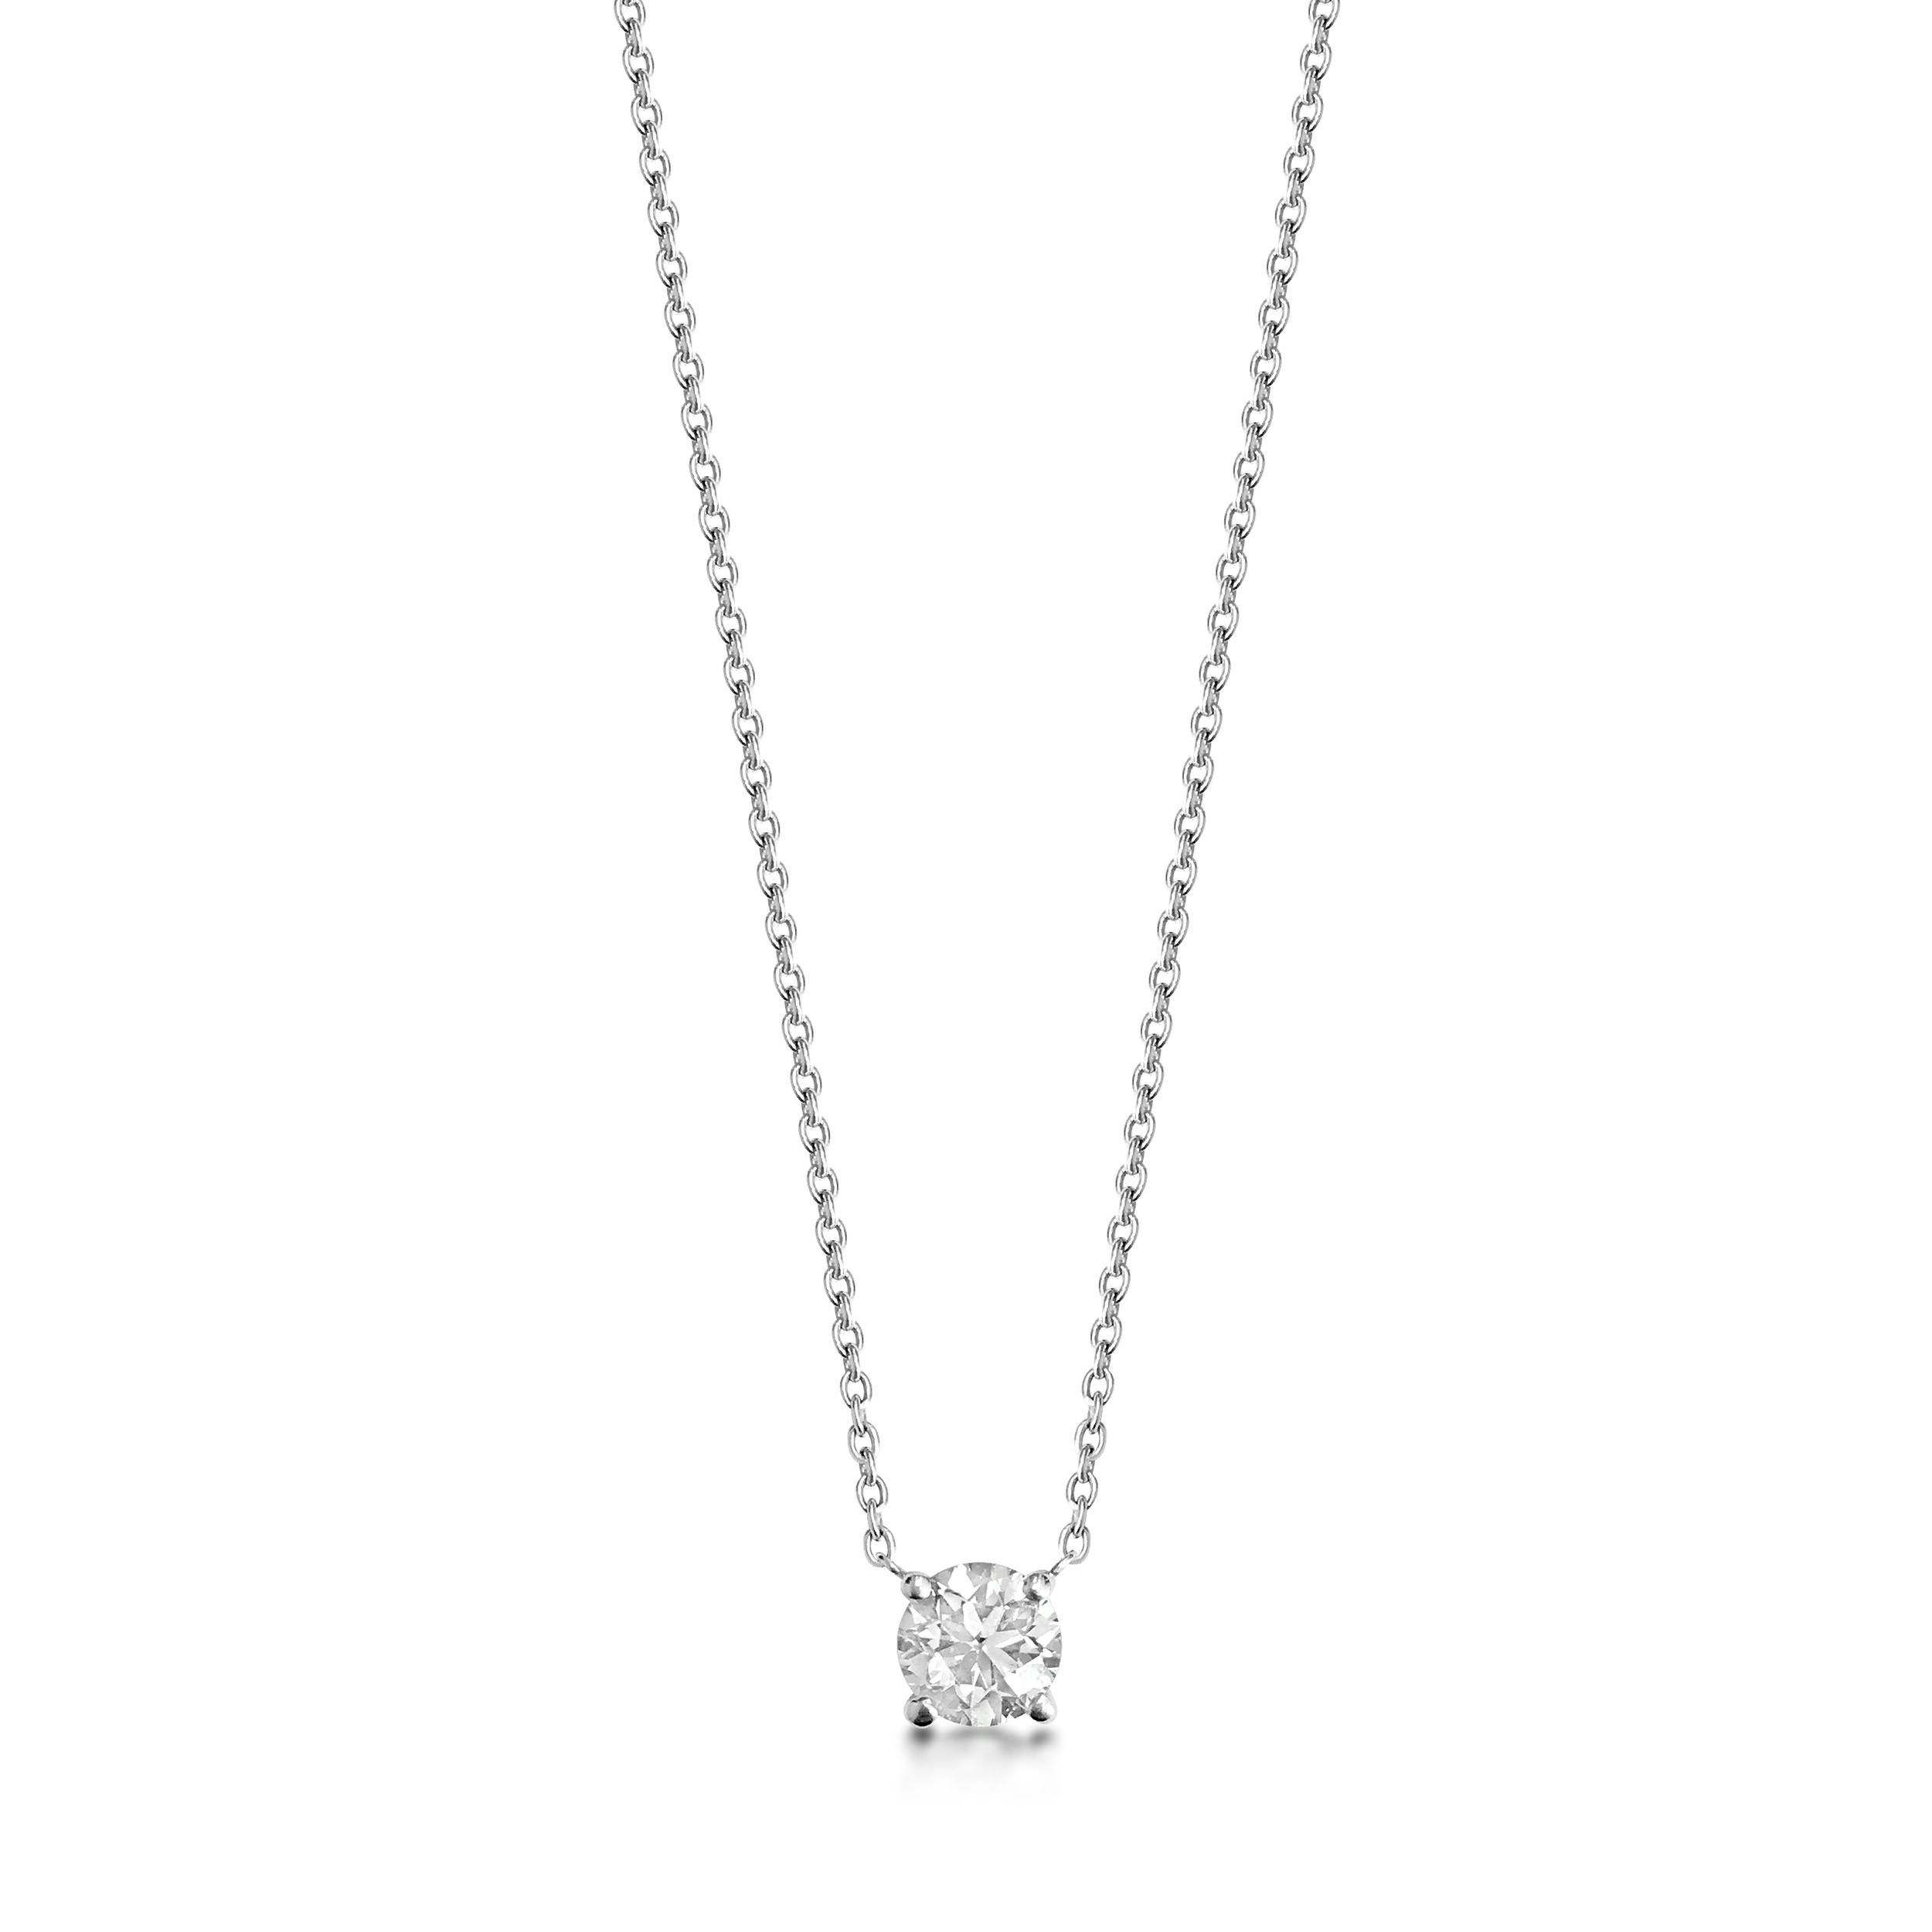 Single-stone-brilliant-cut-diamond-and-18ct-white-gold-floating-pendant-SN97-3.jpg